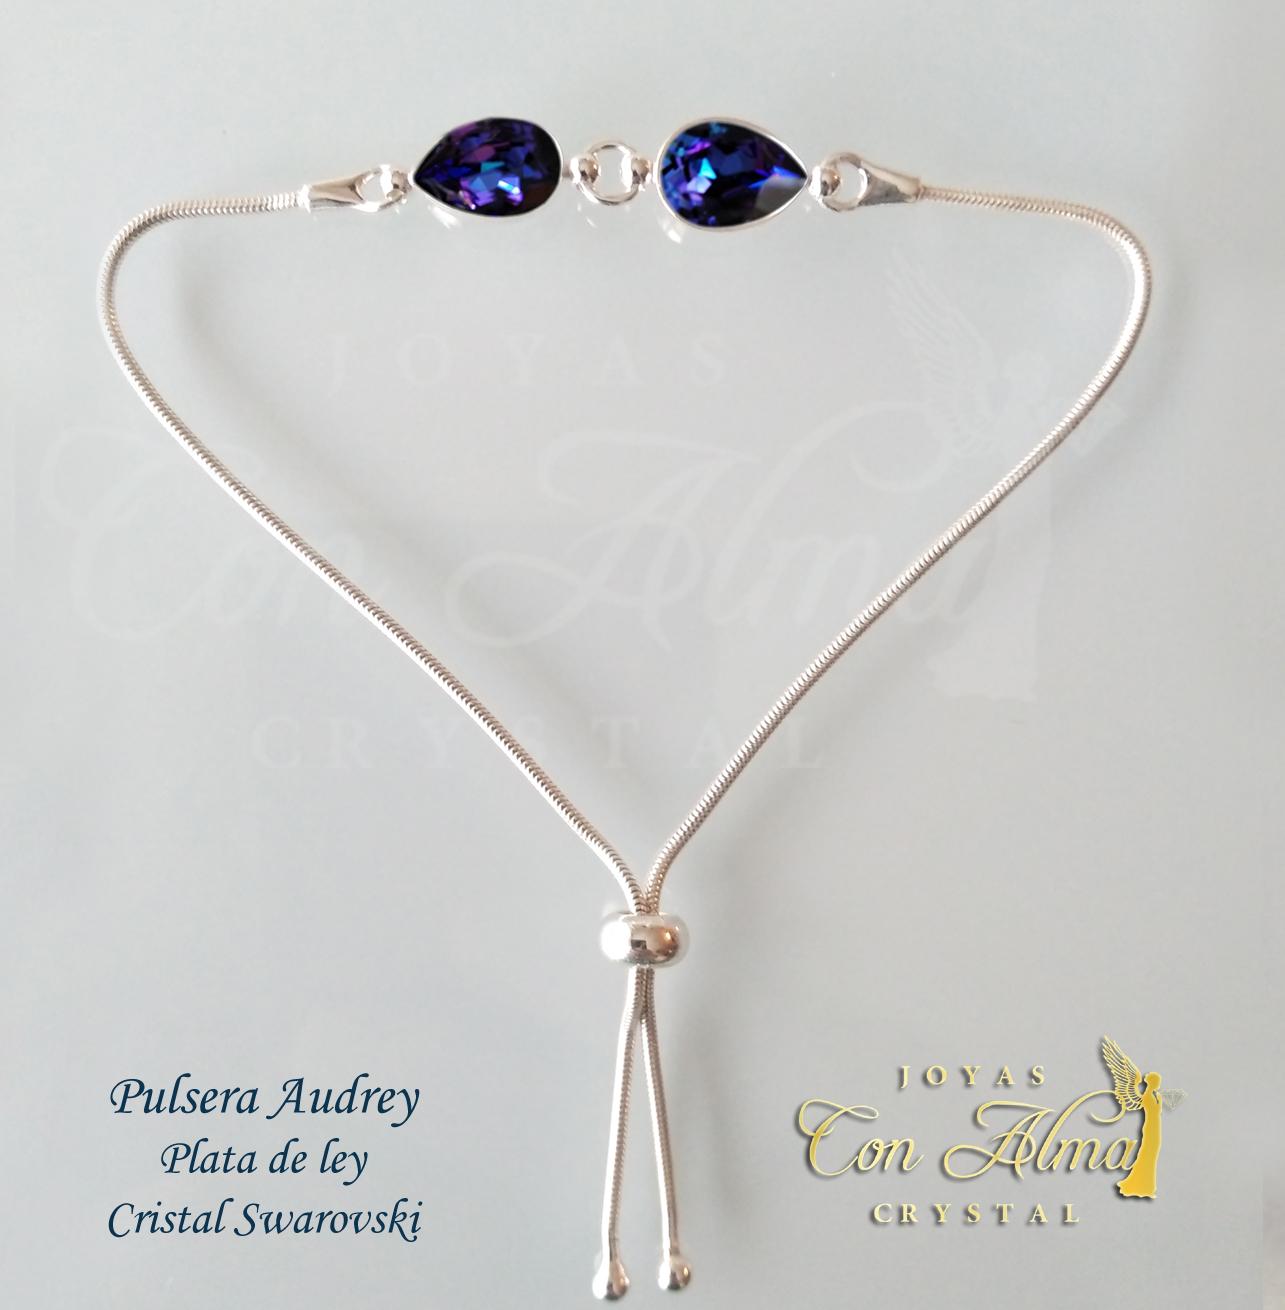 Pulsera Audrey  Alma Crystal